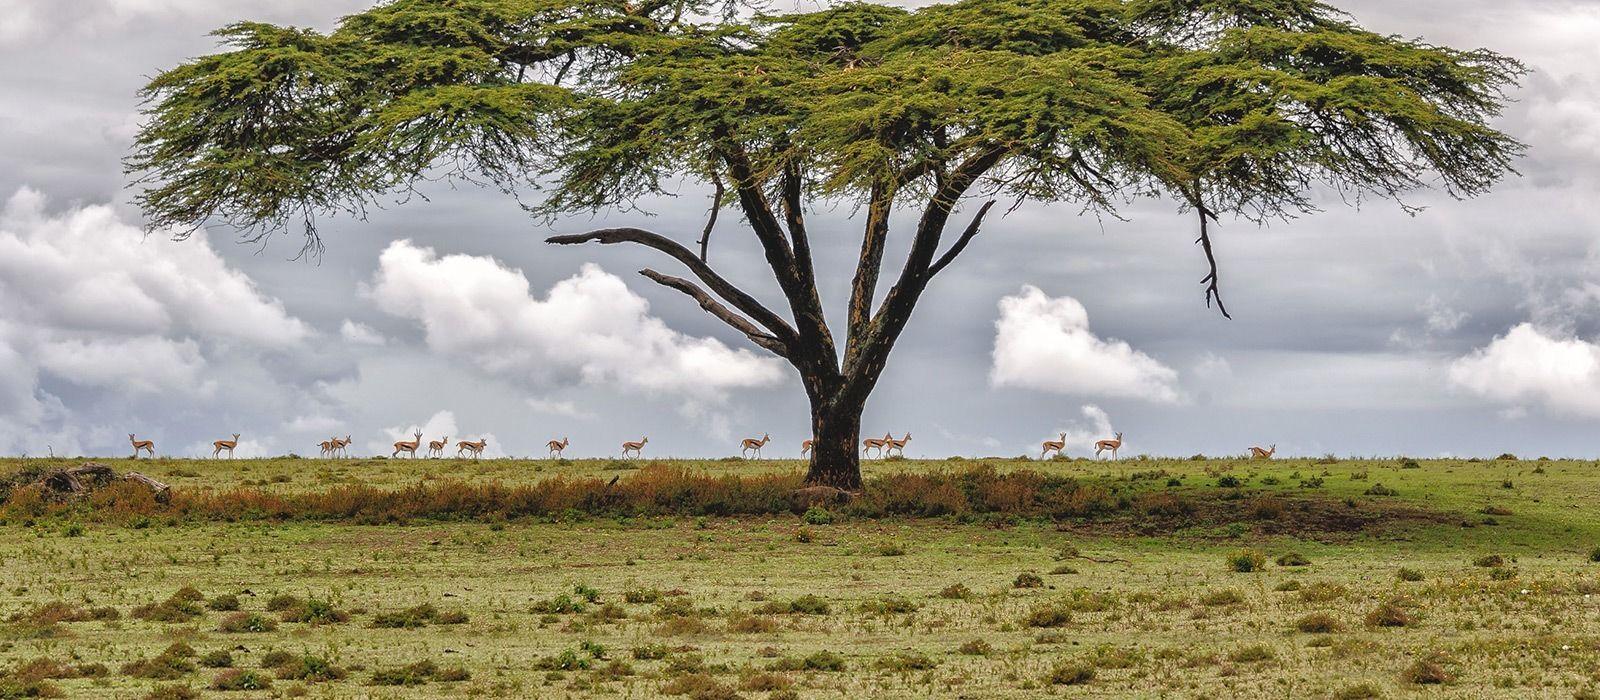 Kenia und Ruanda: Safari und Gorilla-Trekking Urlaub 2